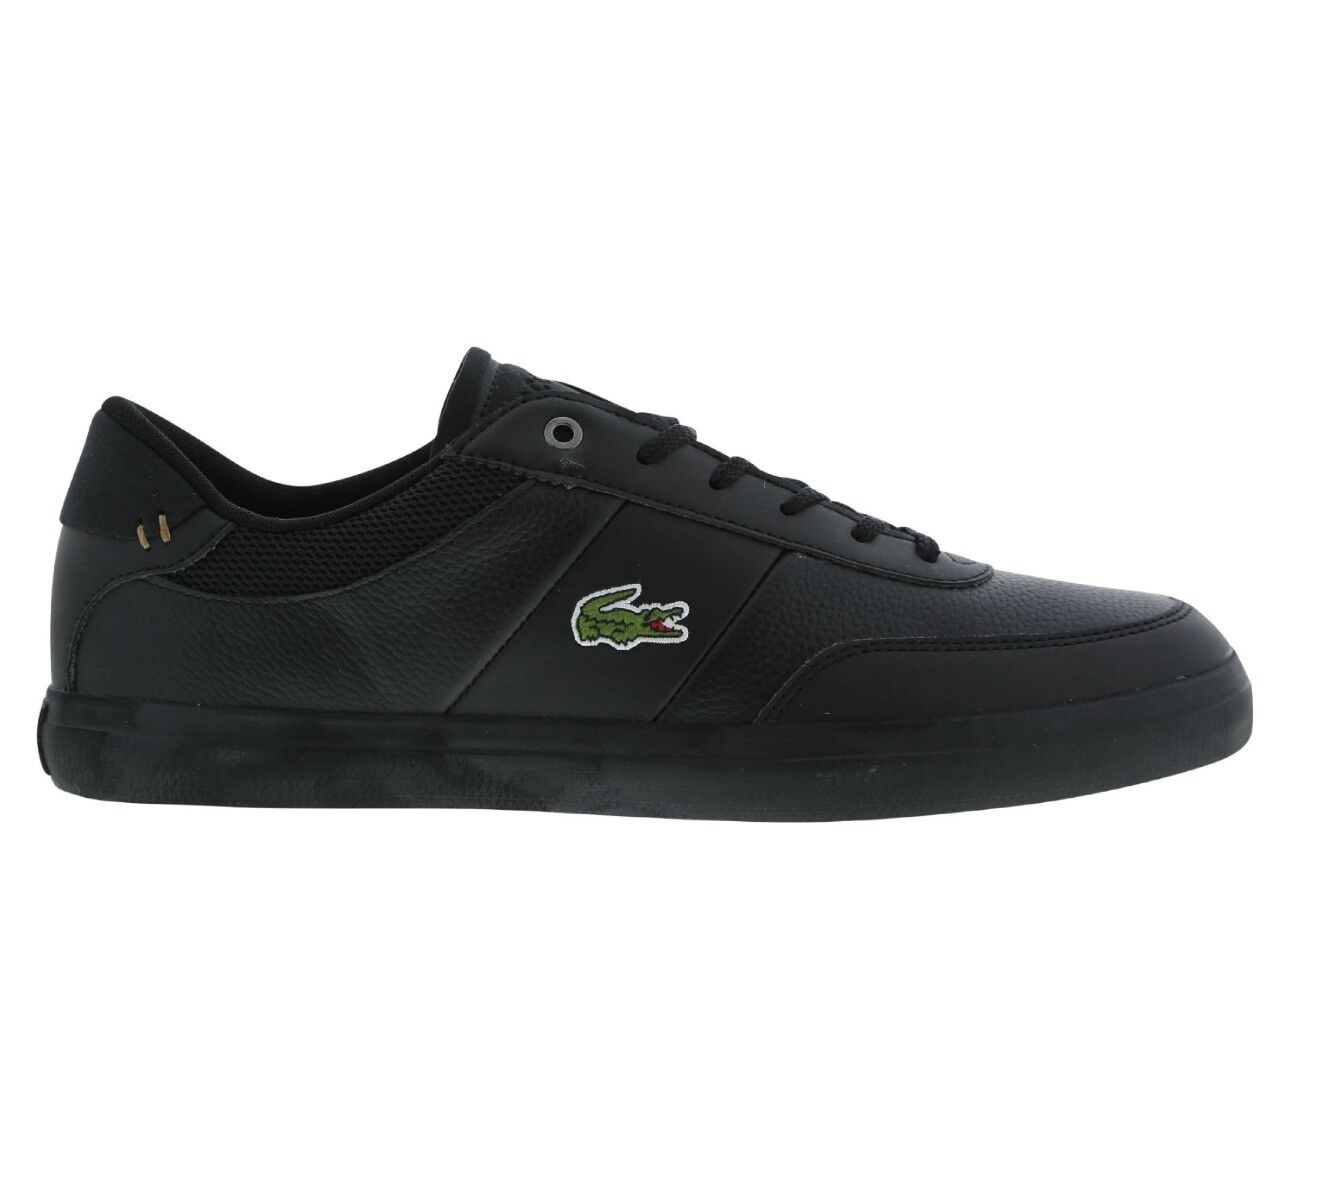 Lacoste Court Master 4171FLE Cam Black Mens Trainer Shoe Size 7.5 - 10 New